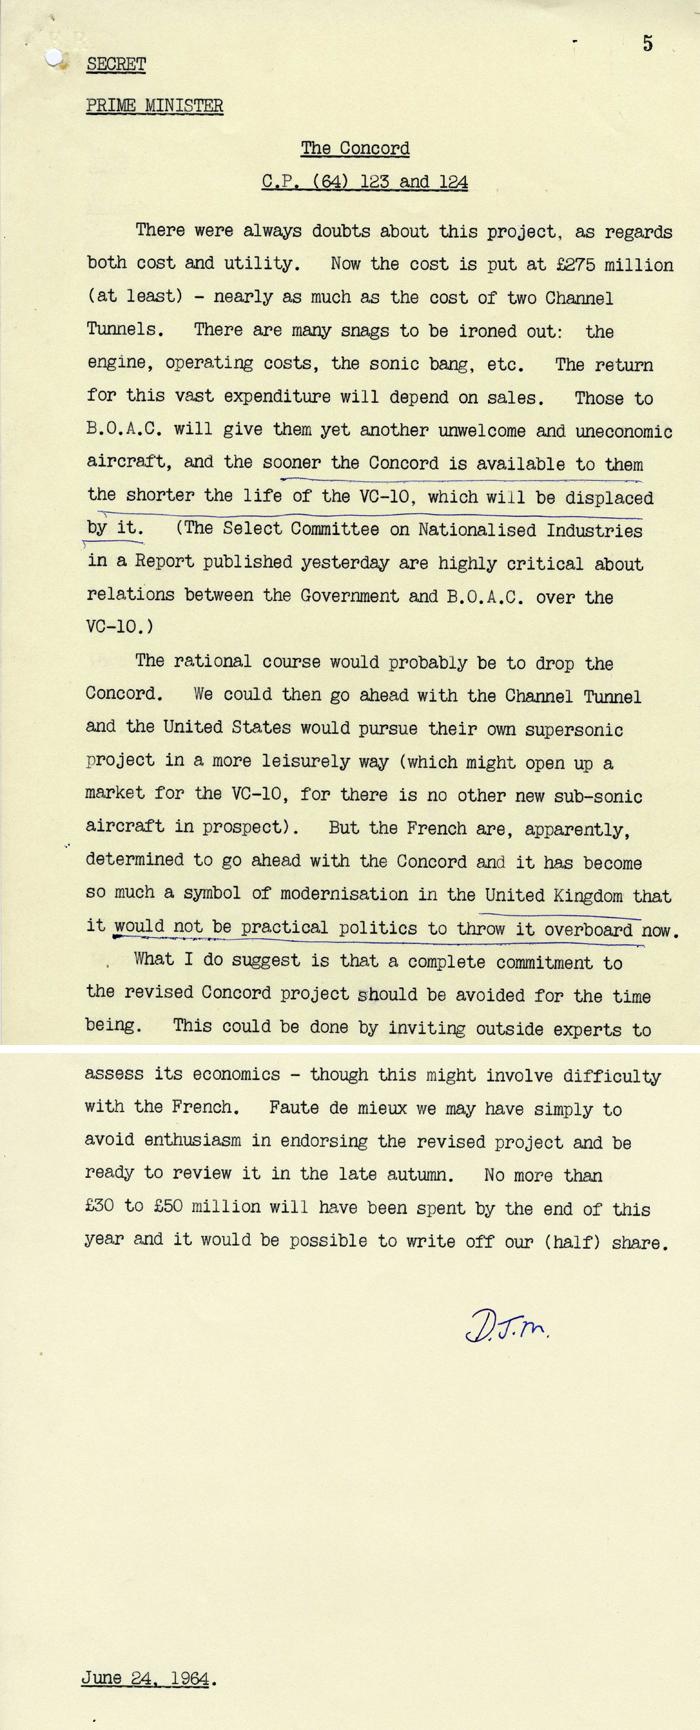 Briefing notes for the Prime Minister Alec Douglas-Home on Concorde, June 1964 (PREM 11/4612)